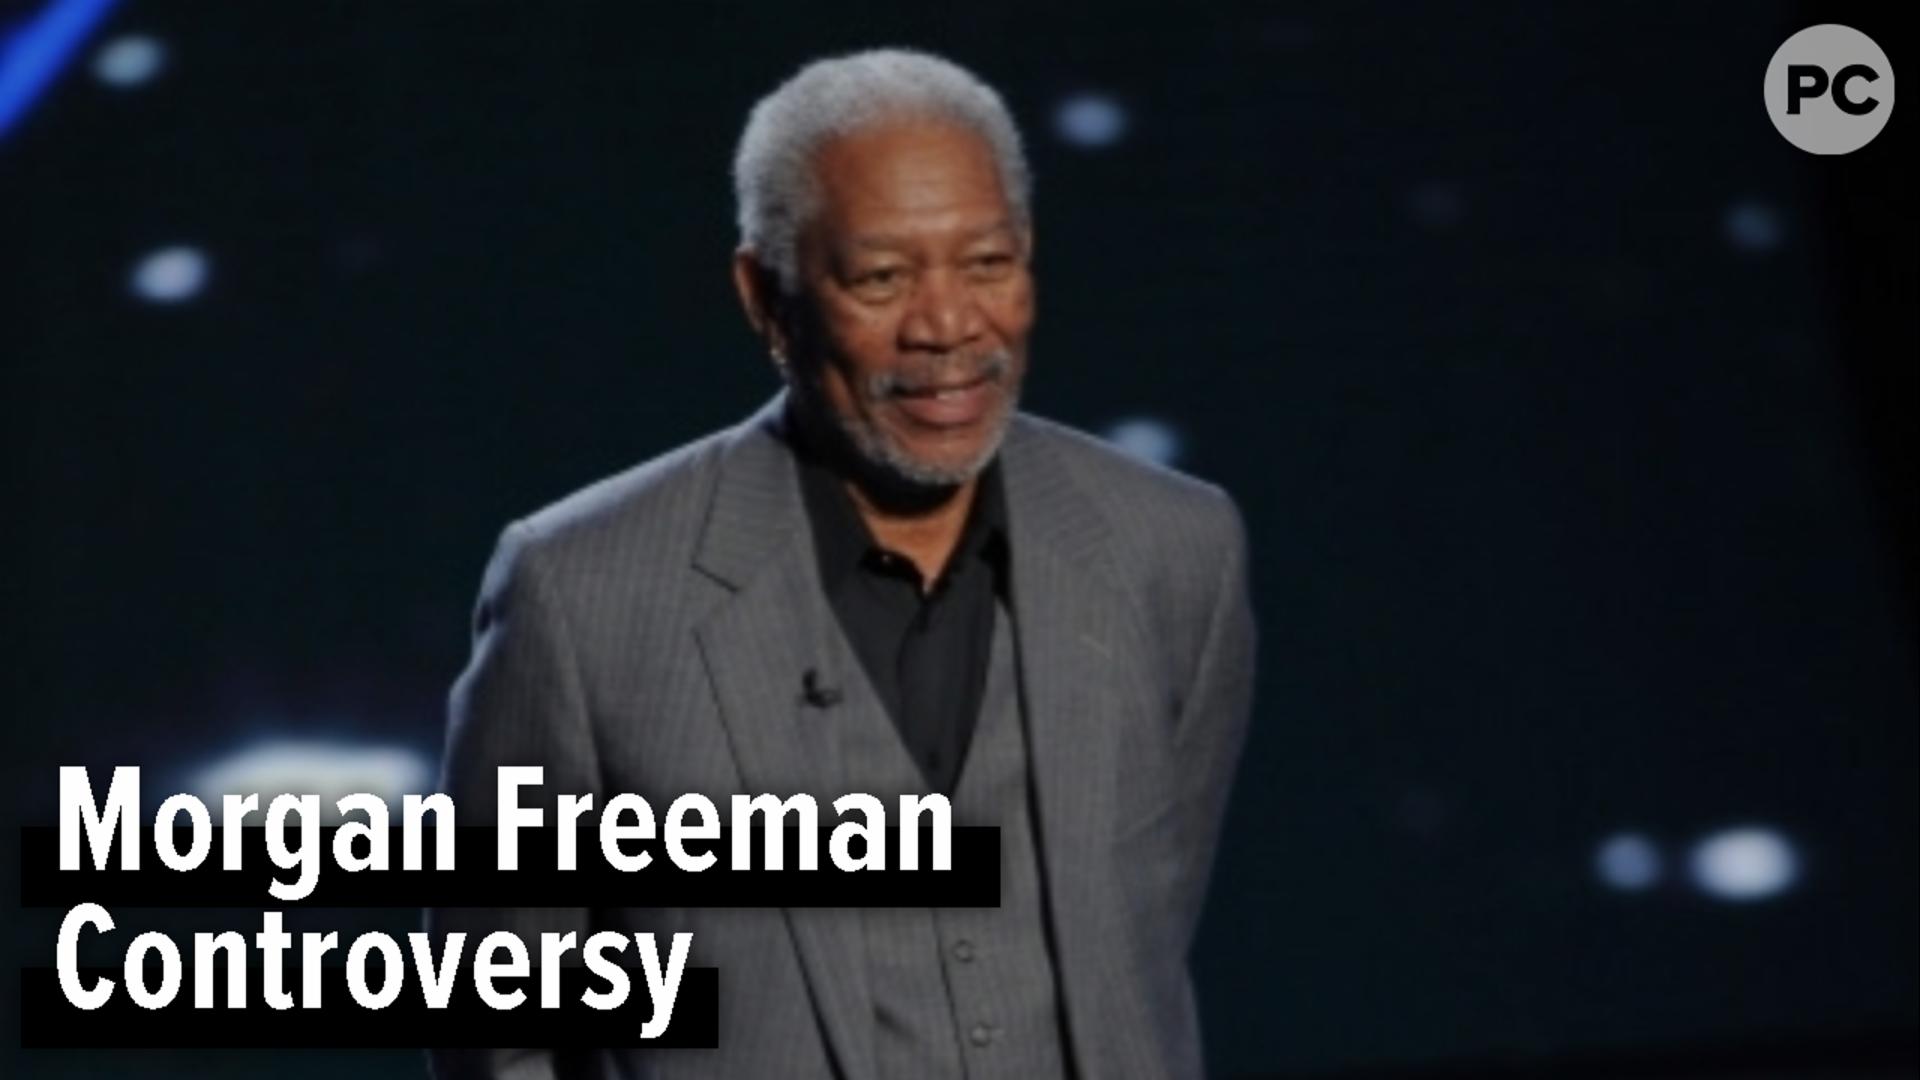 Morgan Freeman Controversy screen capture